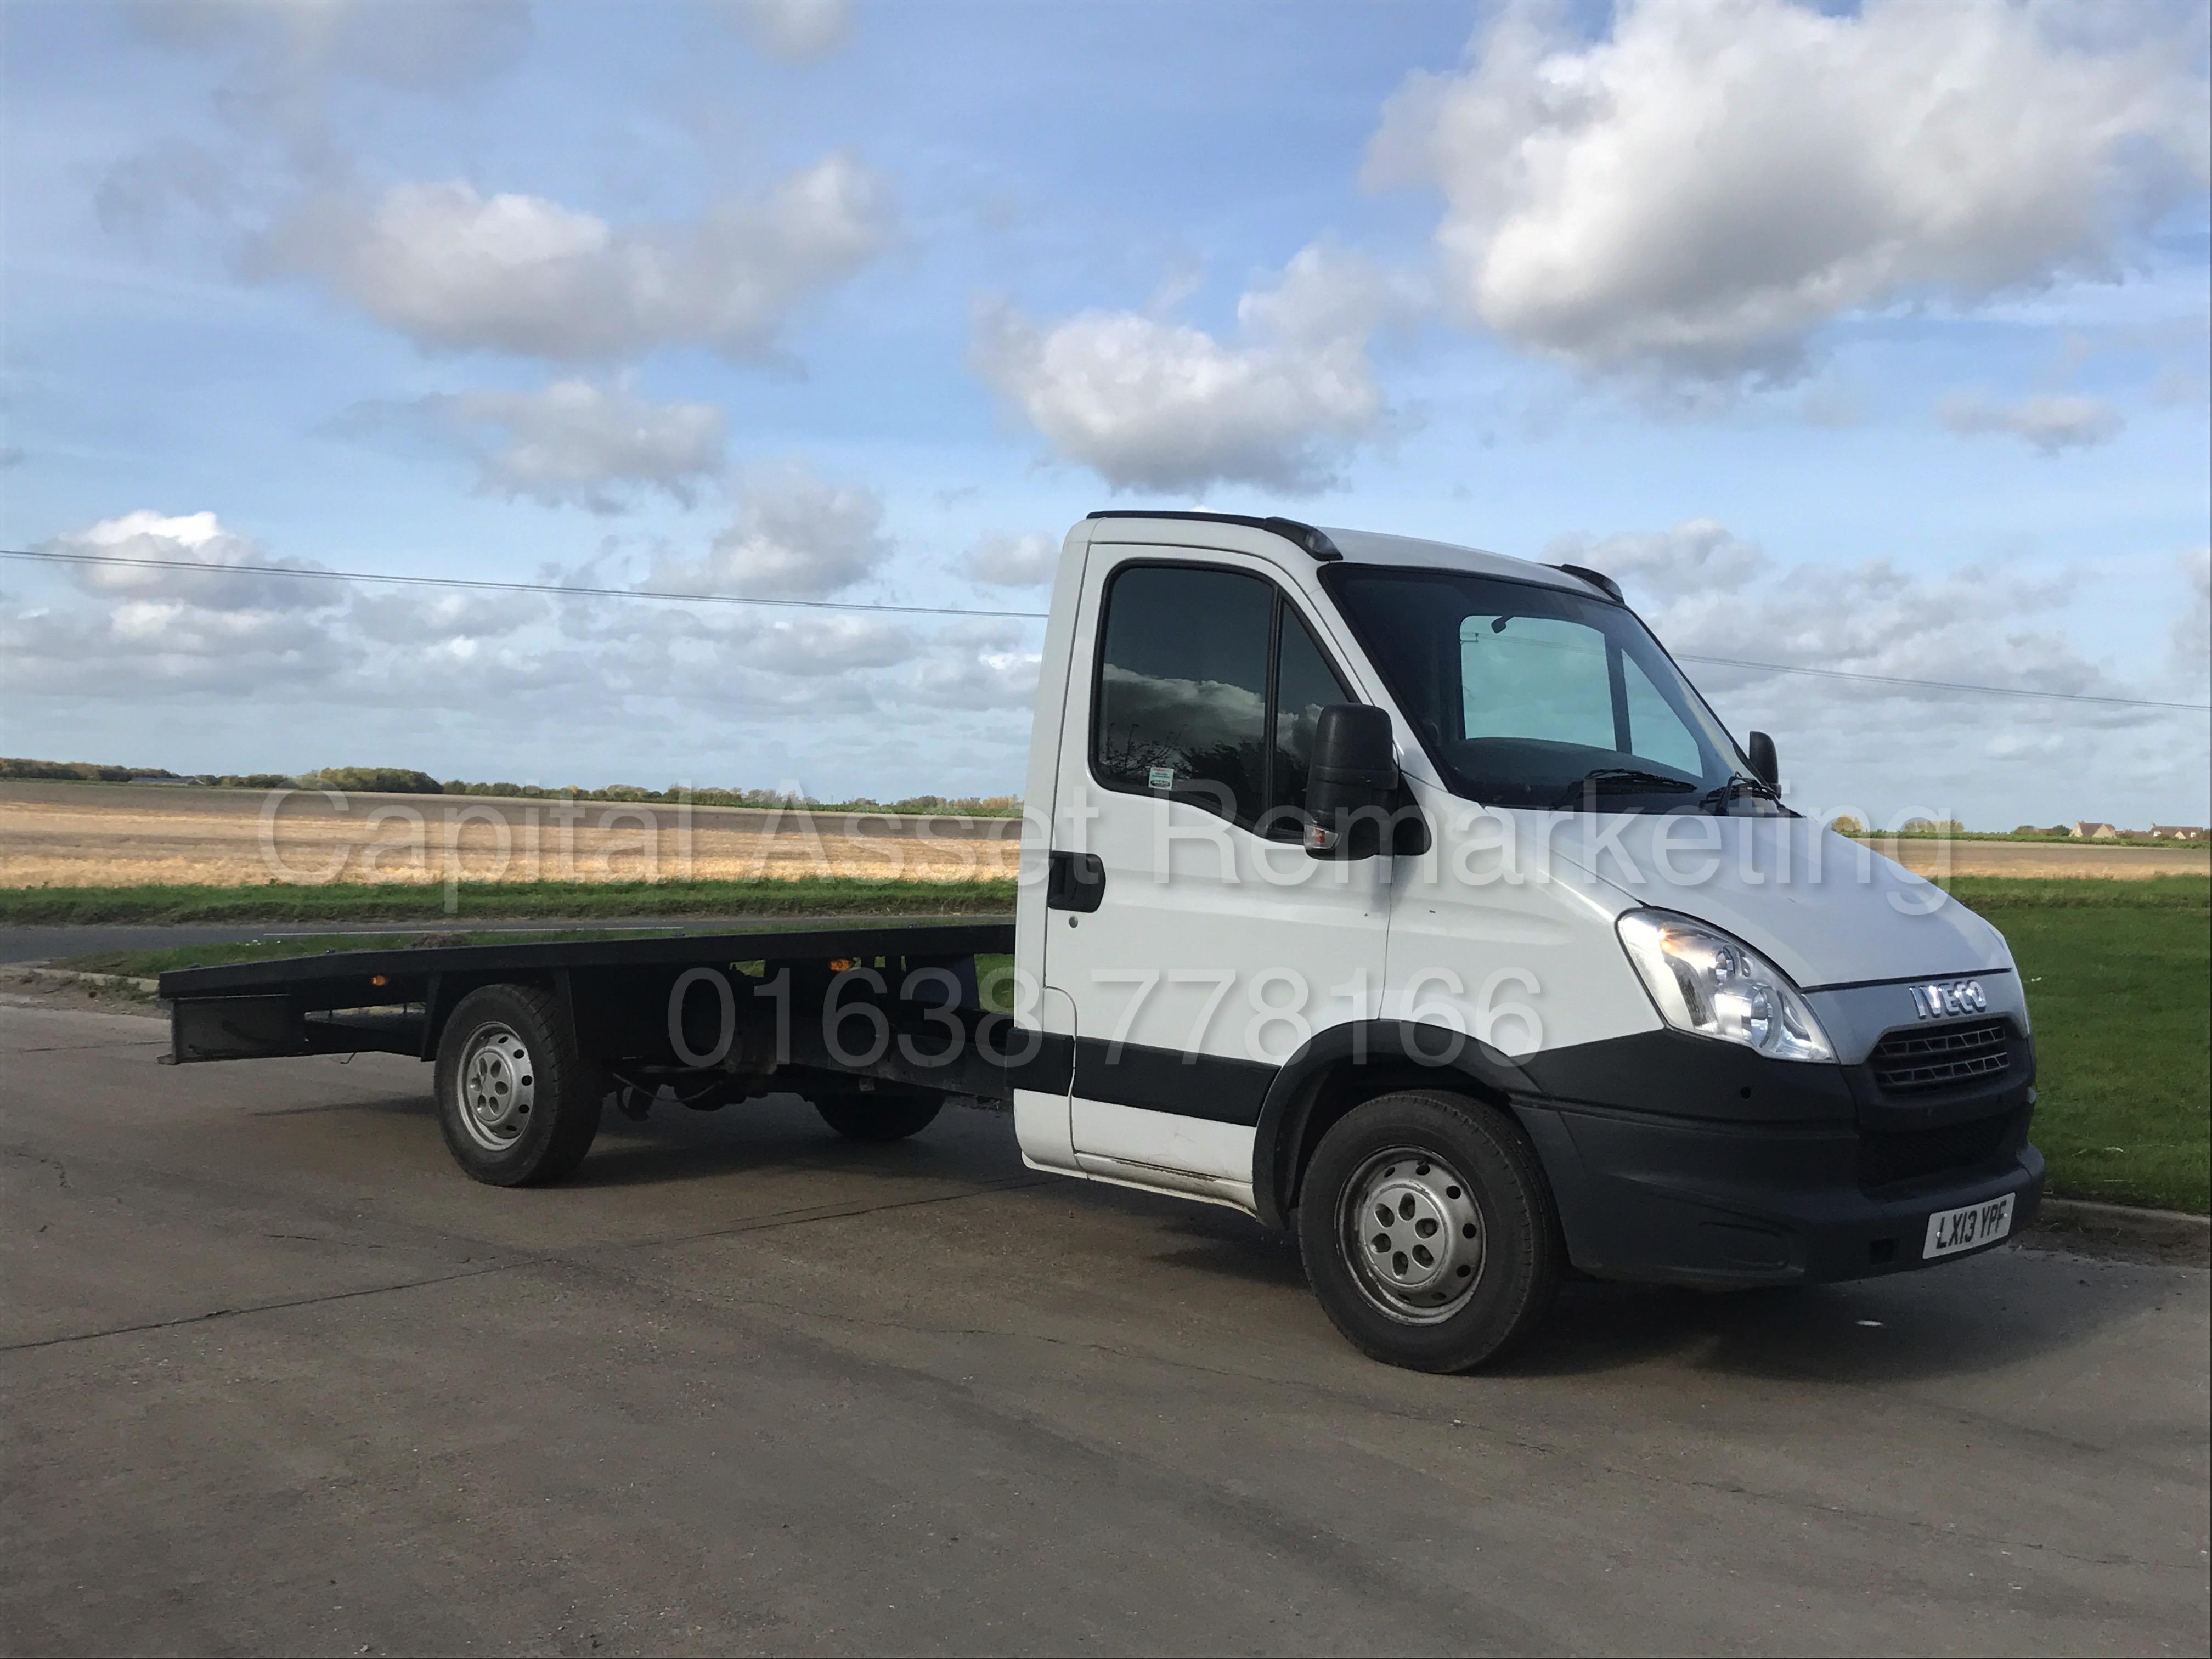 iveco daily 35s11 09 07 2013  u0026 39 13 reg lwb - recovery truck 2287cc  u0026 39 hpi - diesel u0026 39  110 bhp